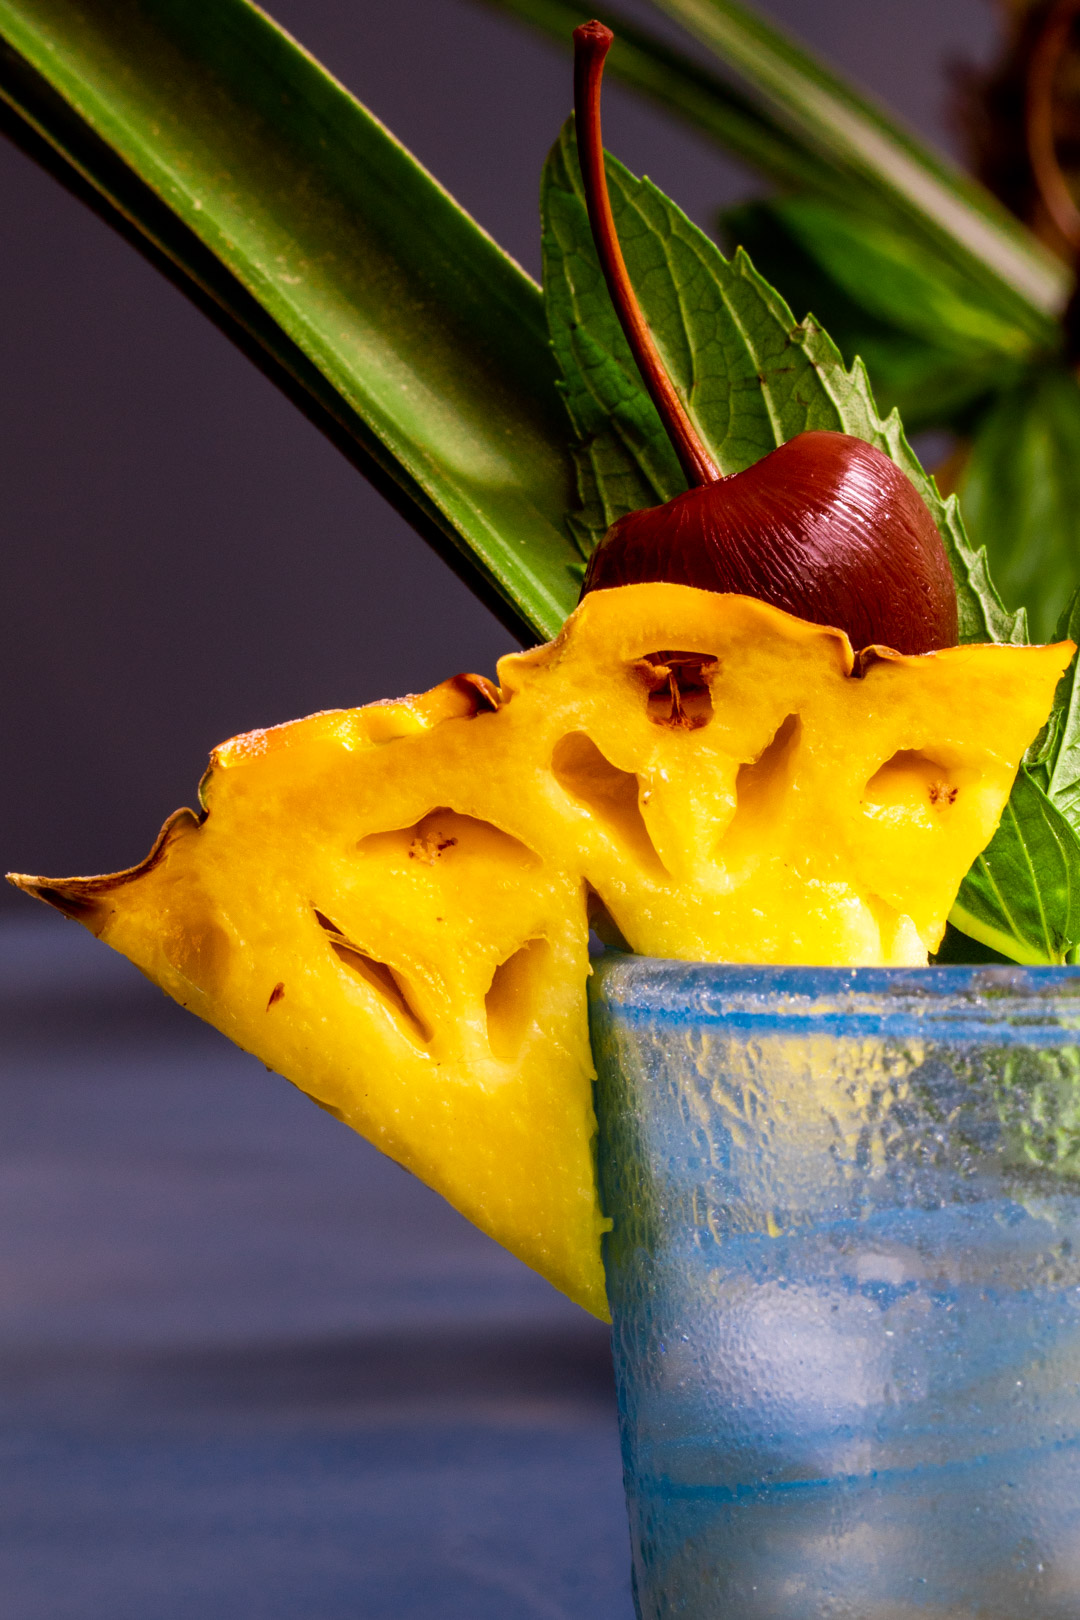 Pickle Mai Tai cocktail close up of pineapple garnish